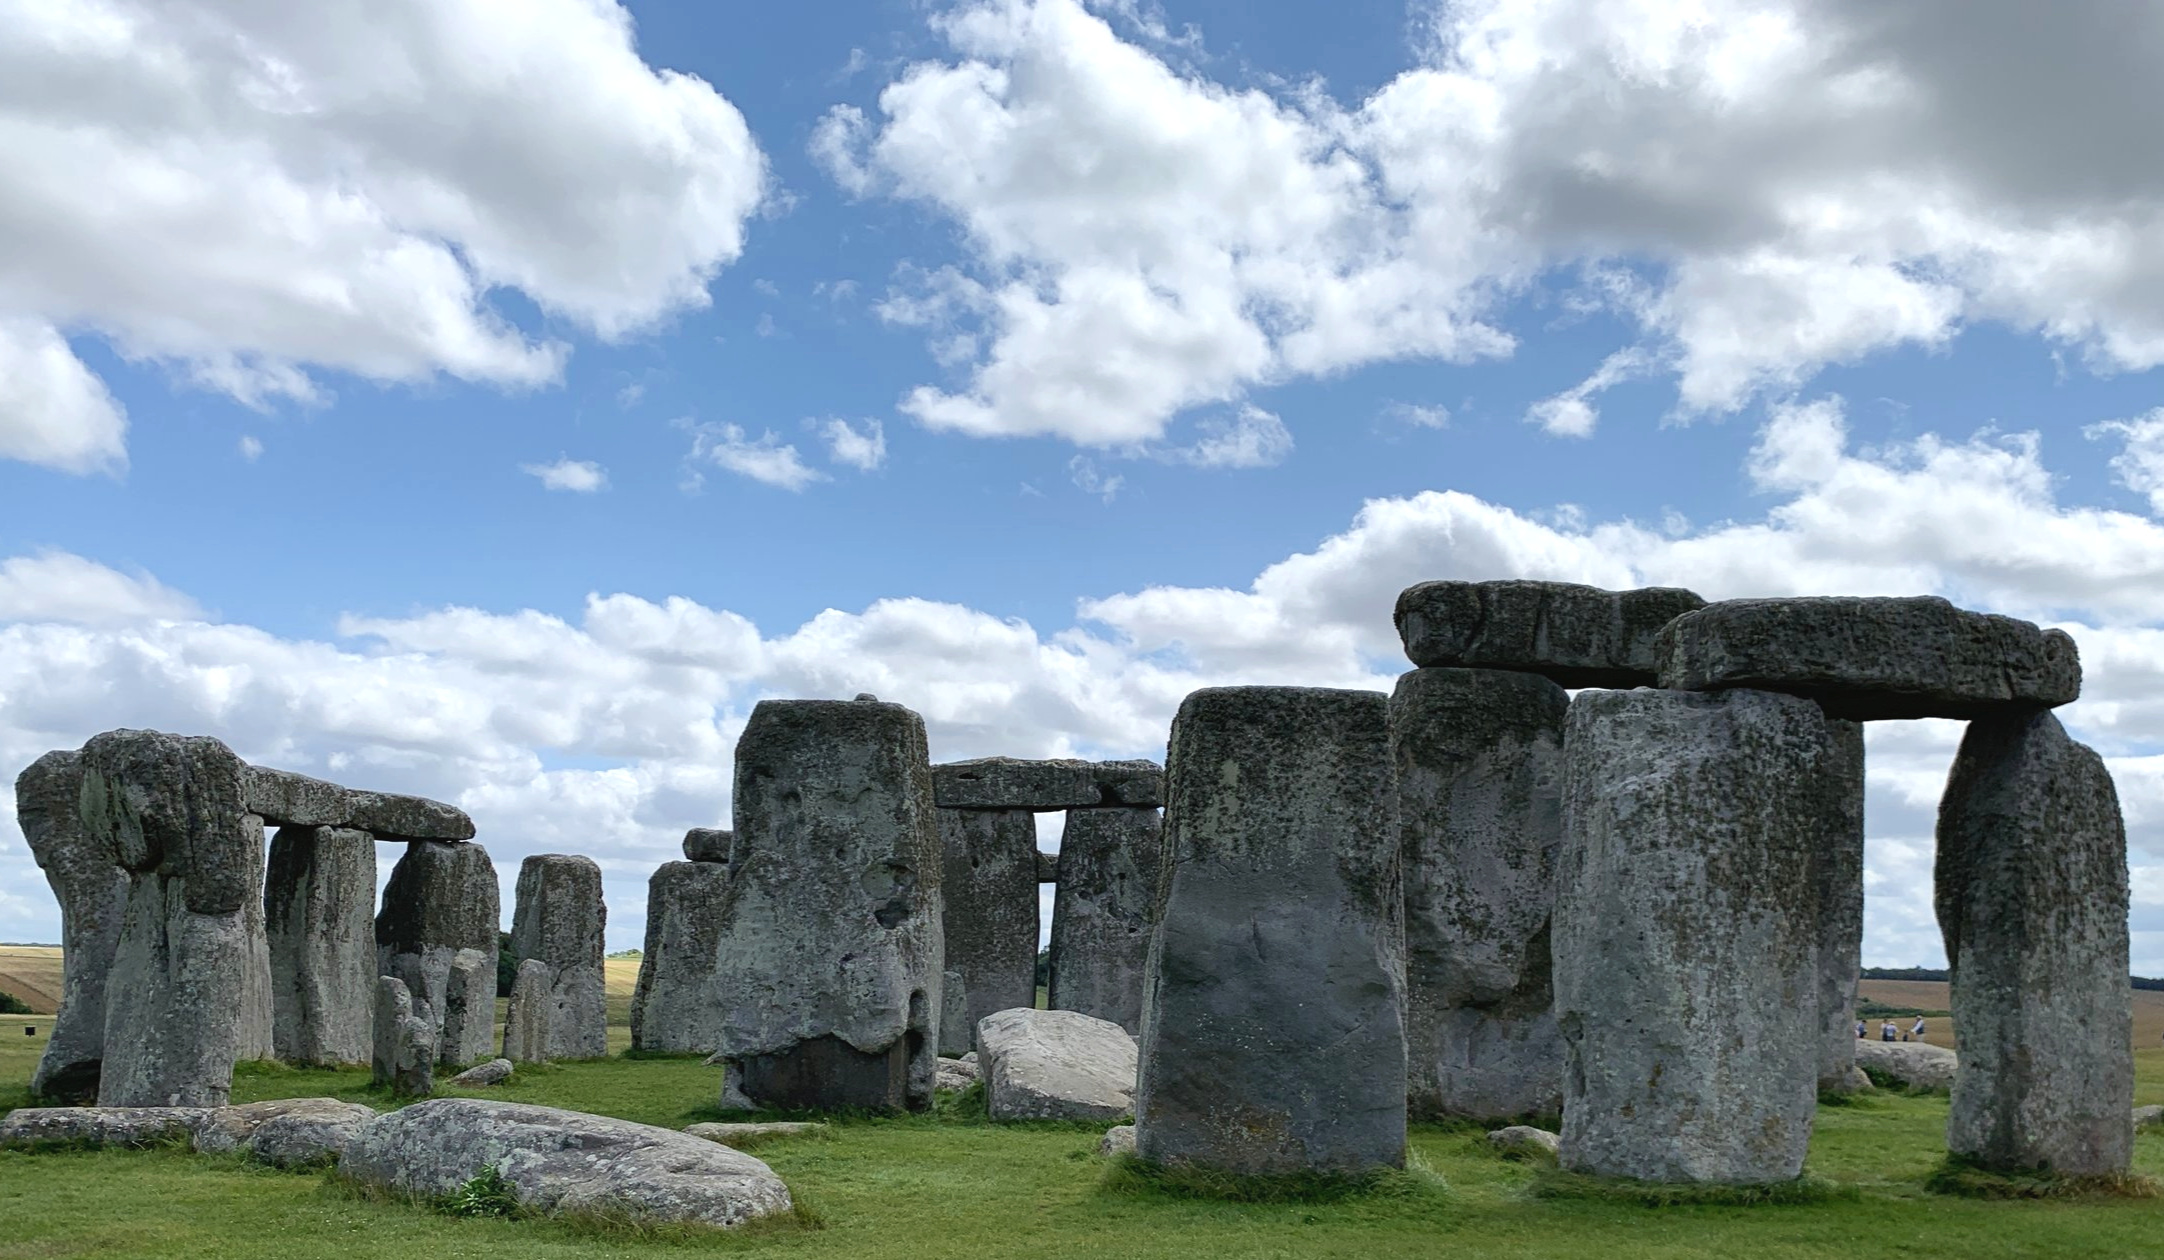 Stonehenge, near Salisbury